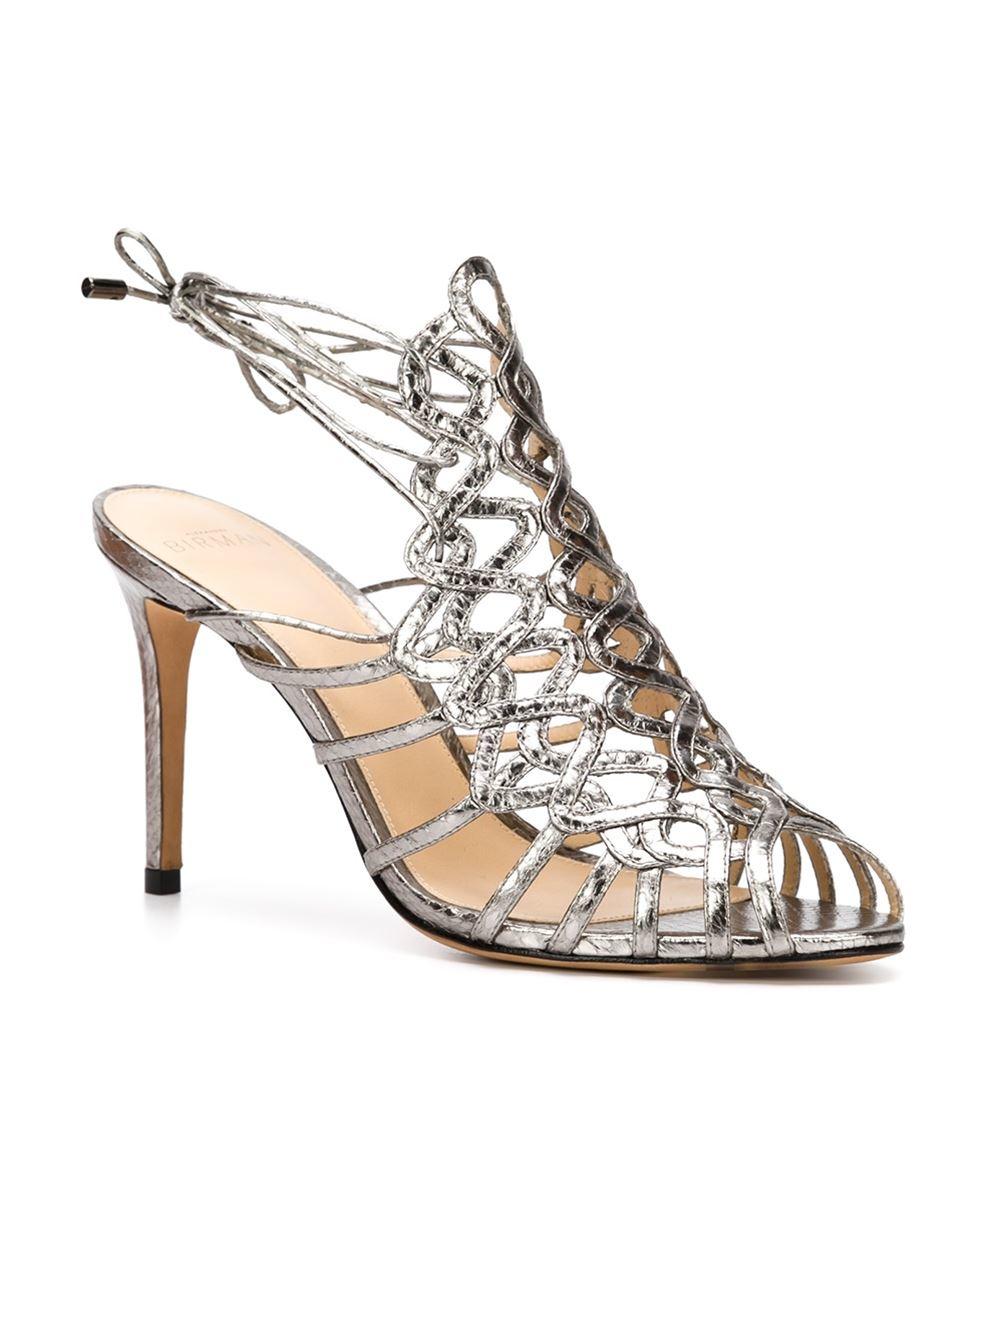 Alexandre birman Strappy Metallic Cage Sandals in Gray | Lyst